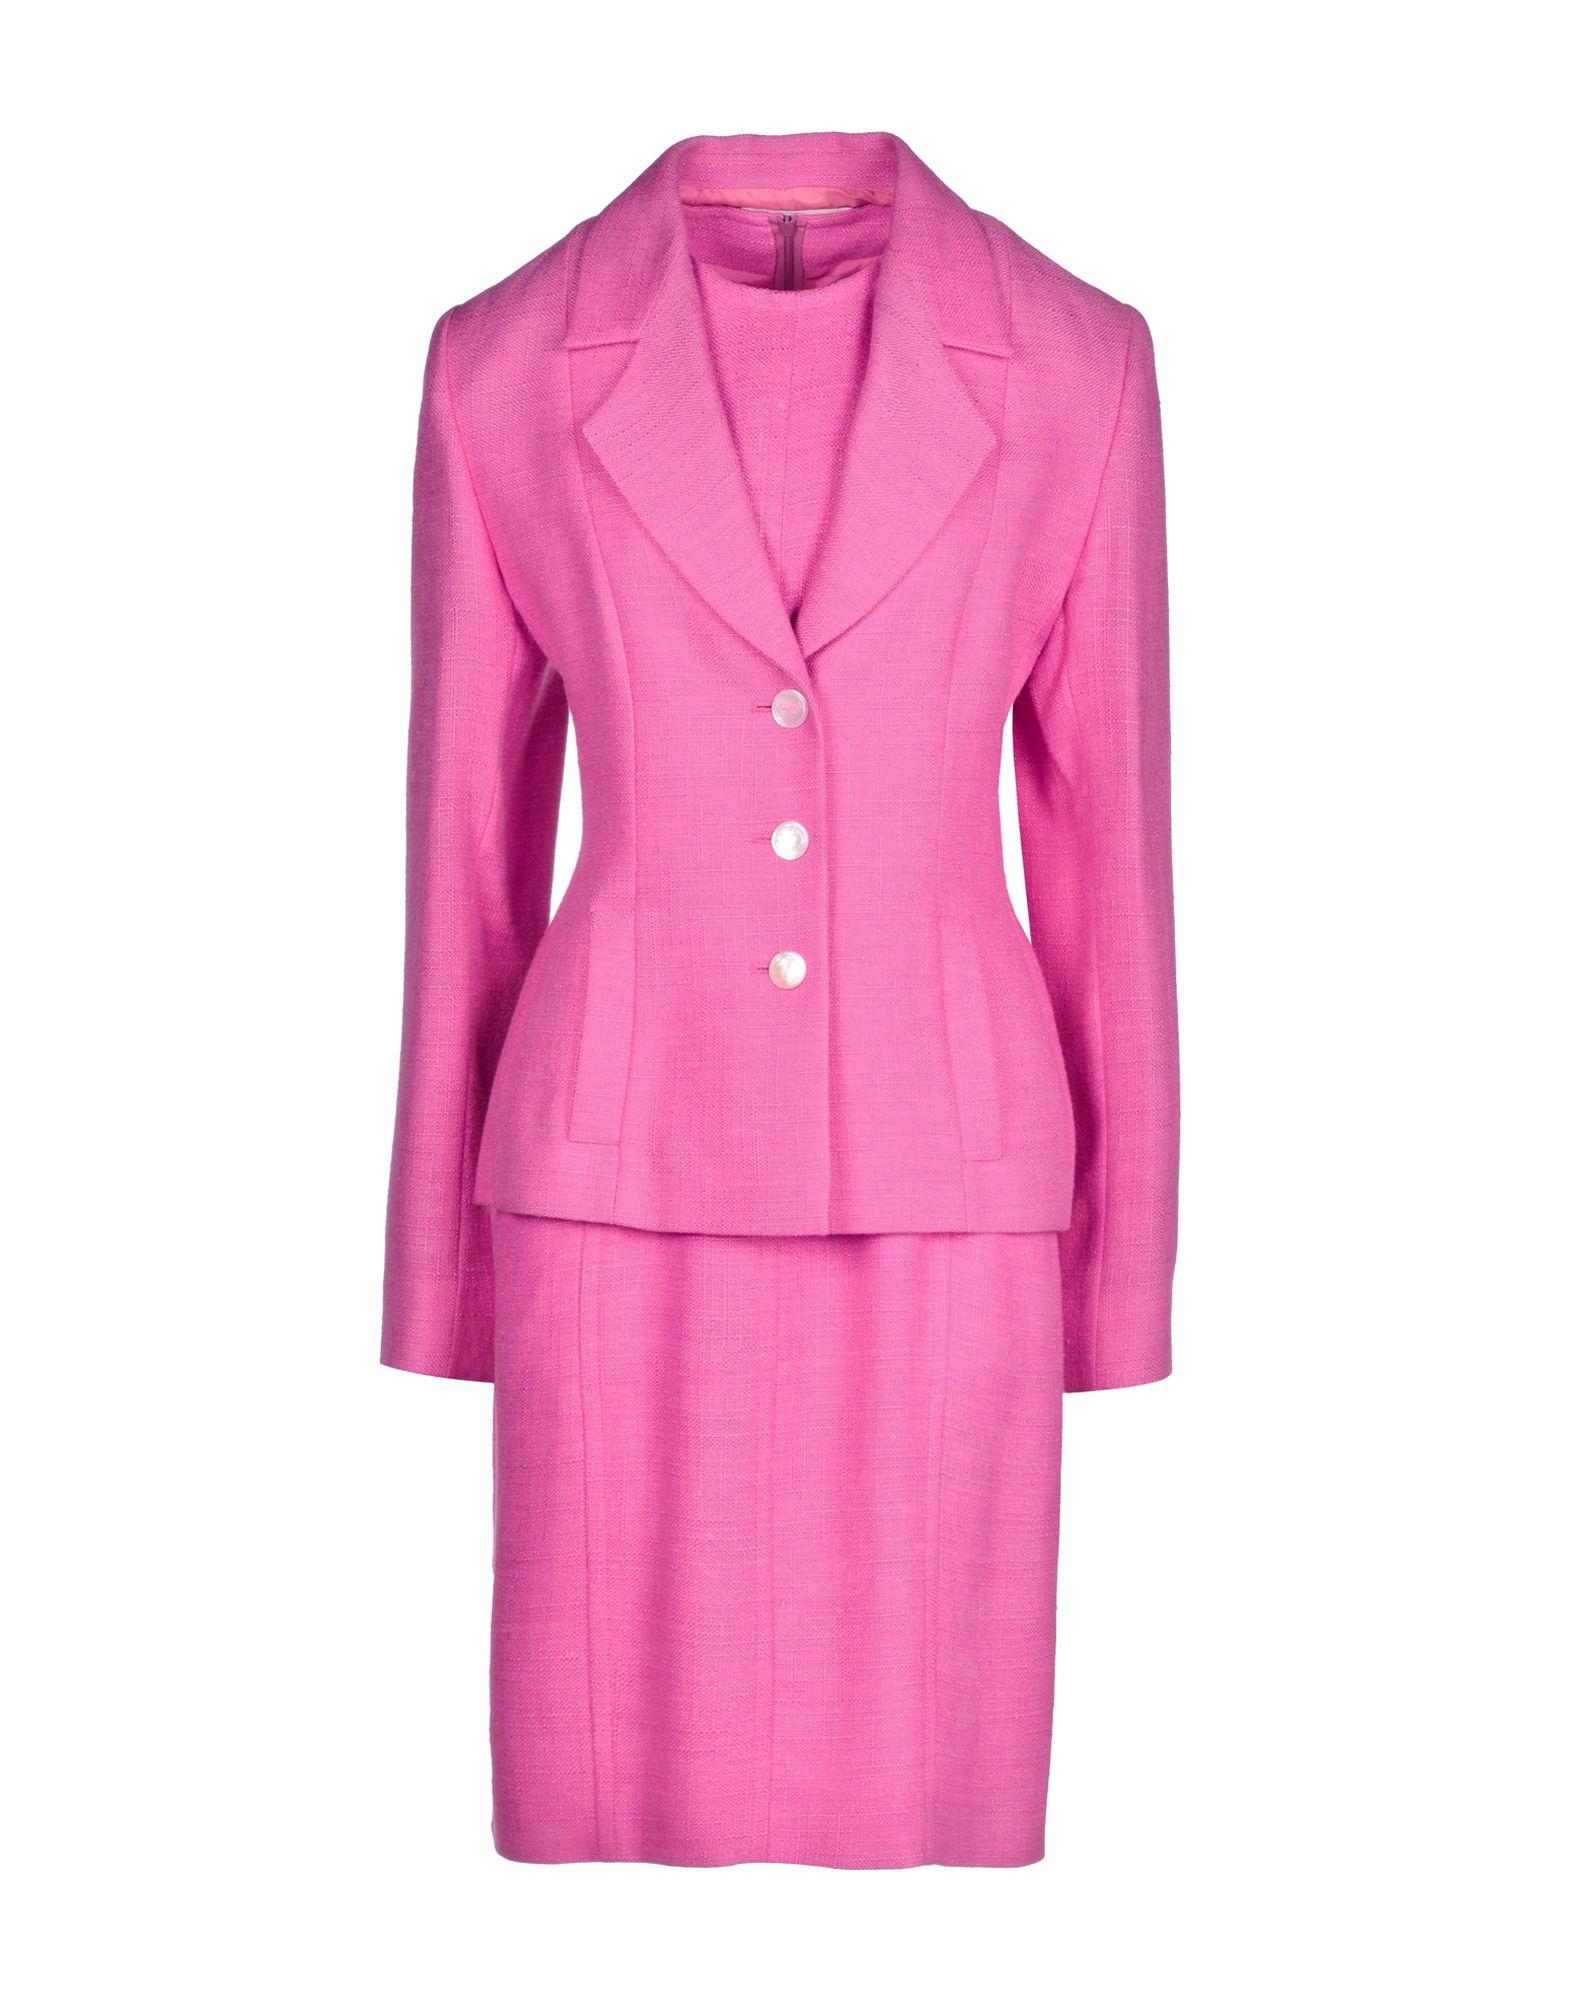 lyst yohji yamamoto womens suit in purple